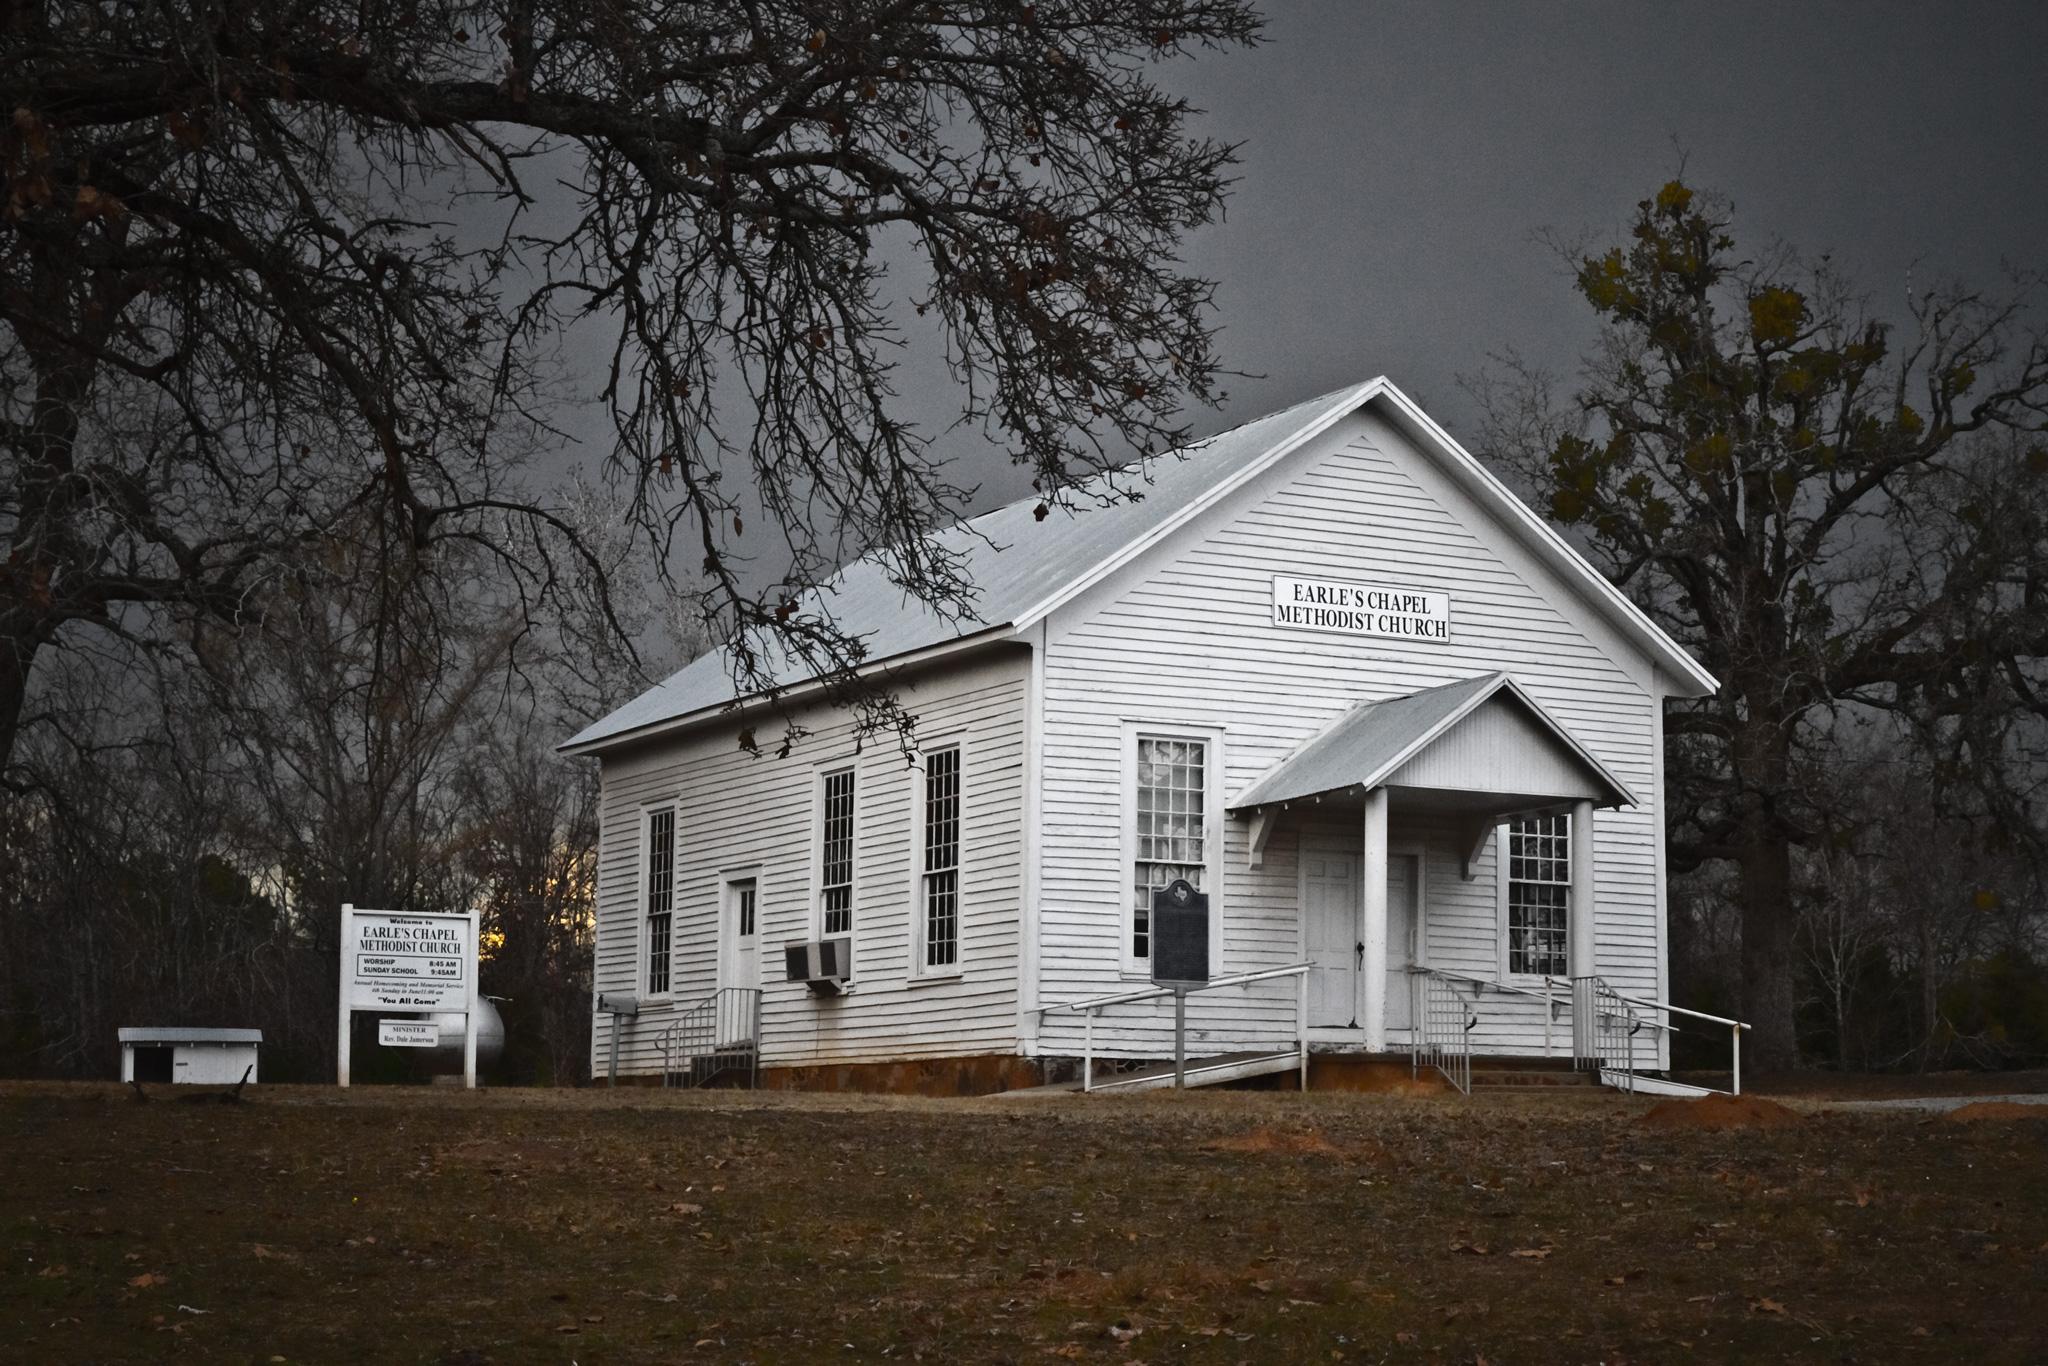 Earle's-Chapel-Methodist-Church.jpg